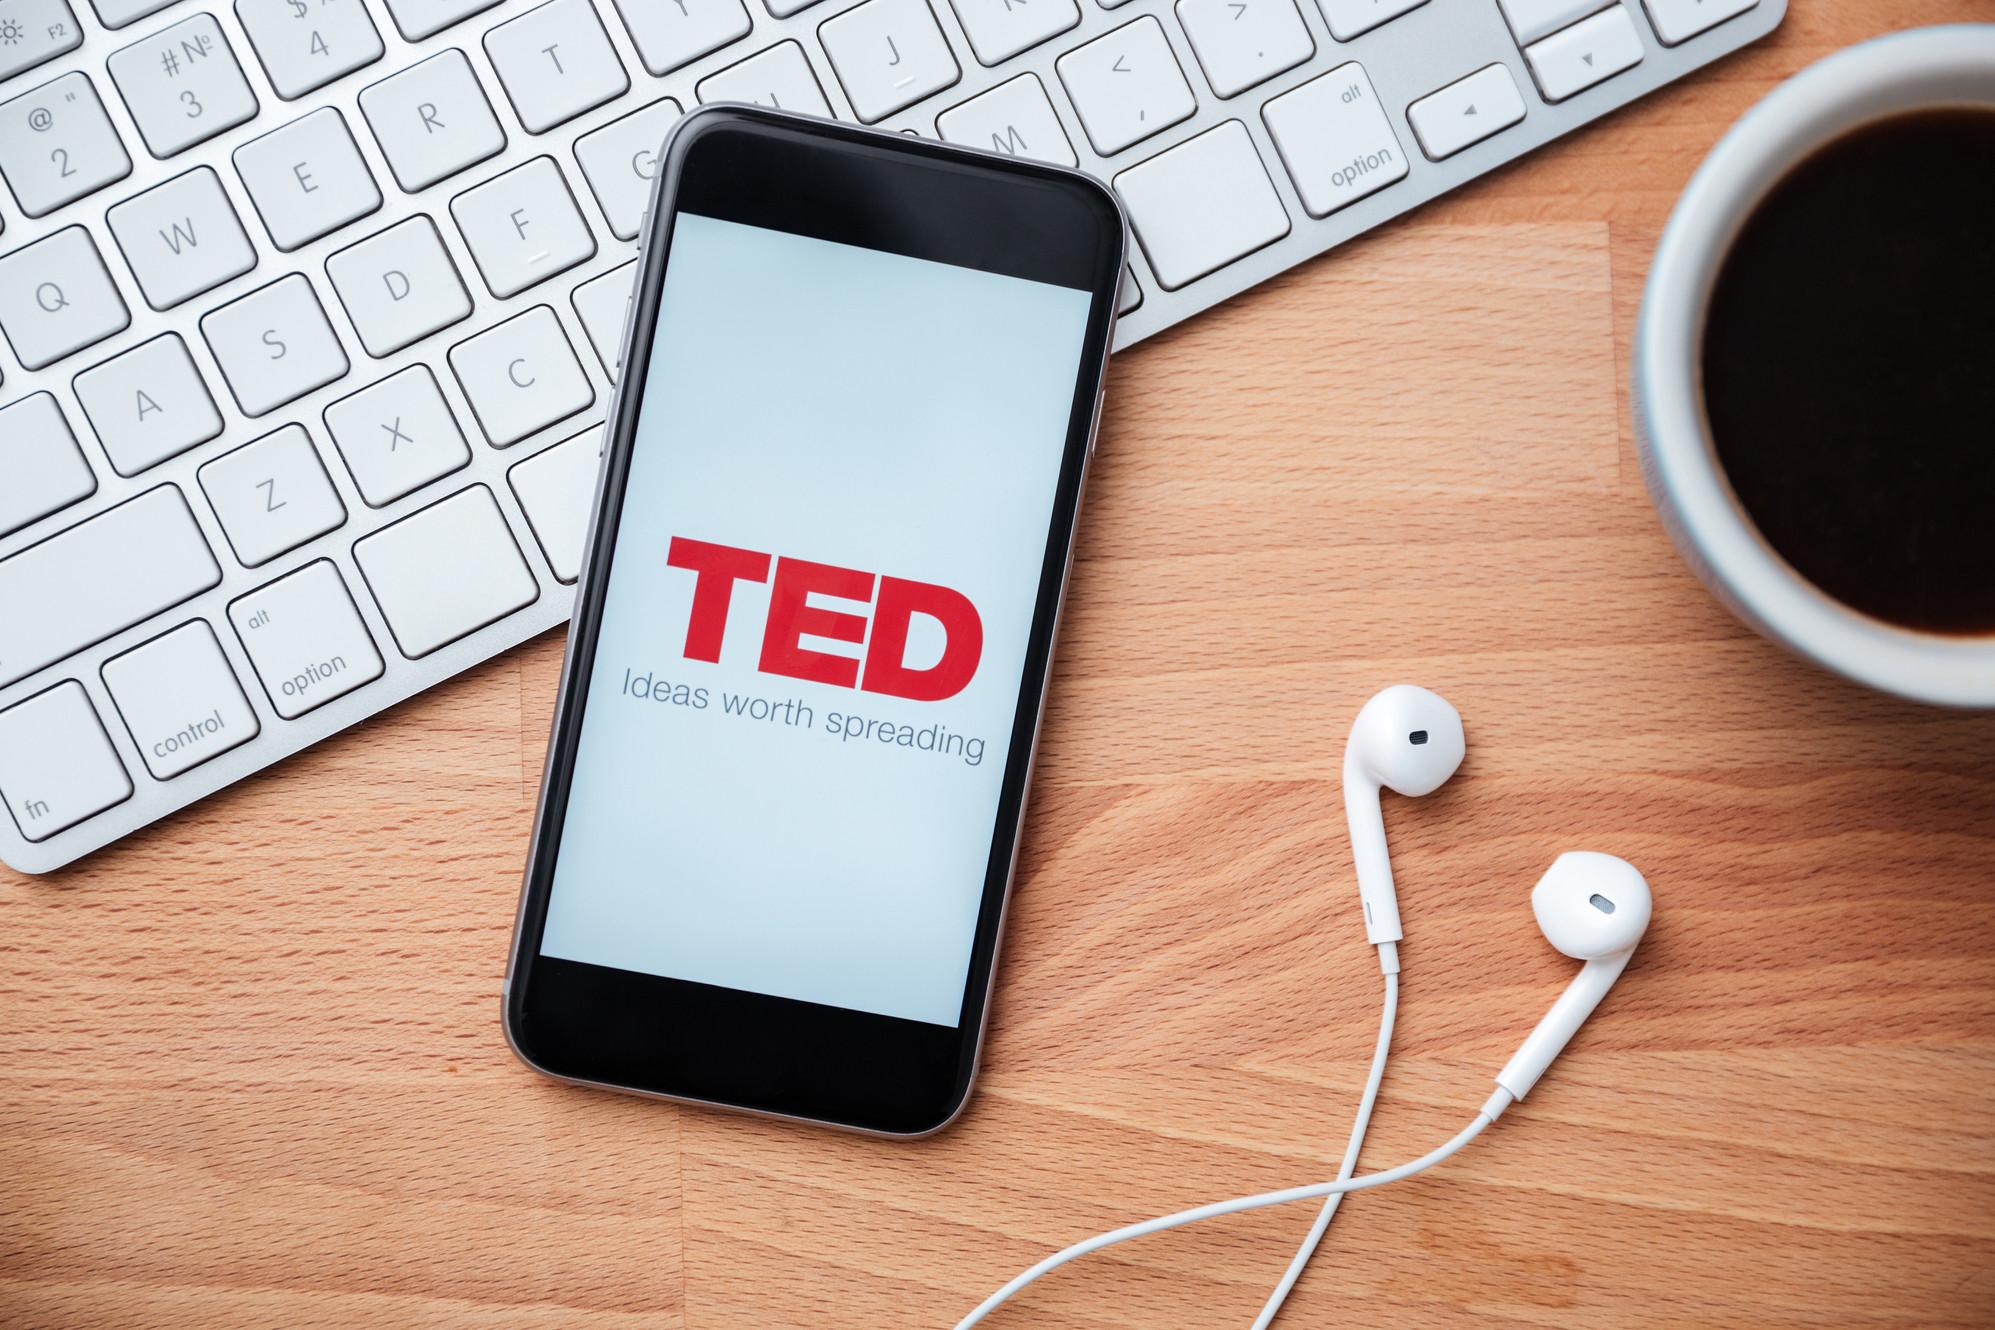 TEDxMississauga 2019 | Speaker Application Form